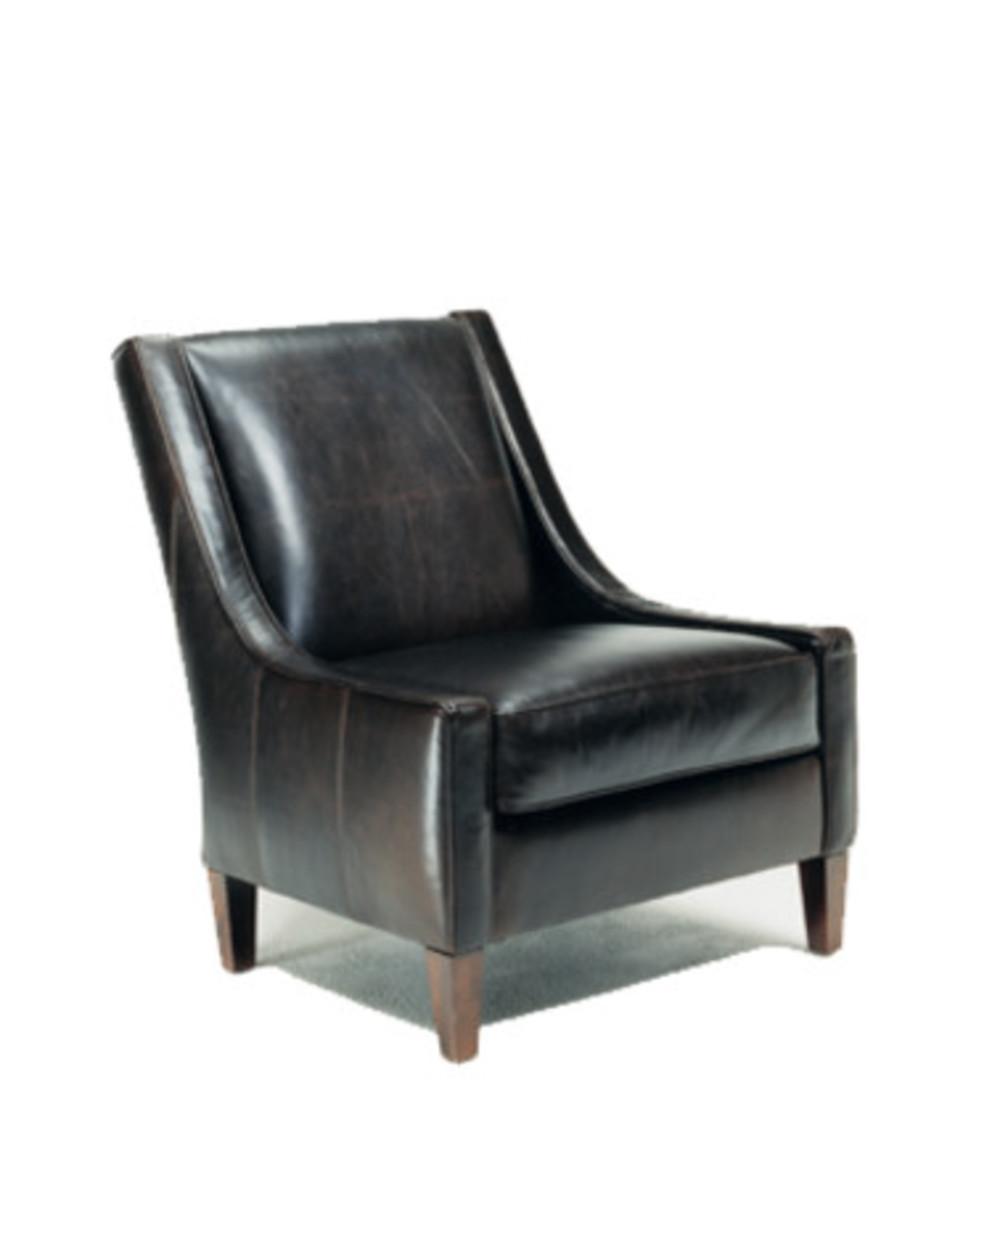 Precedent - Norris Chair